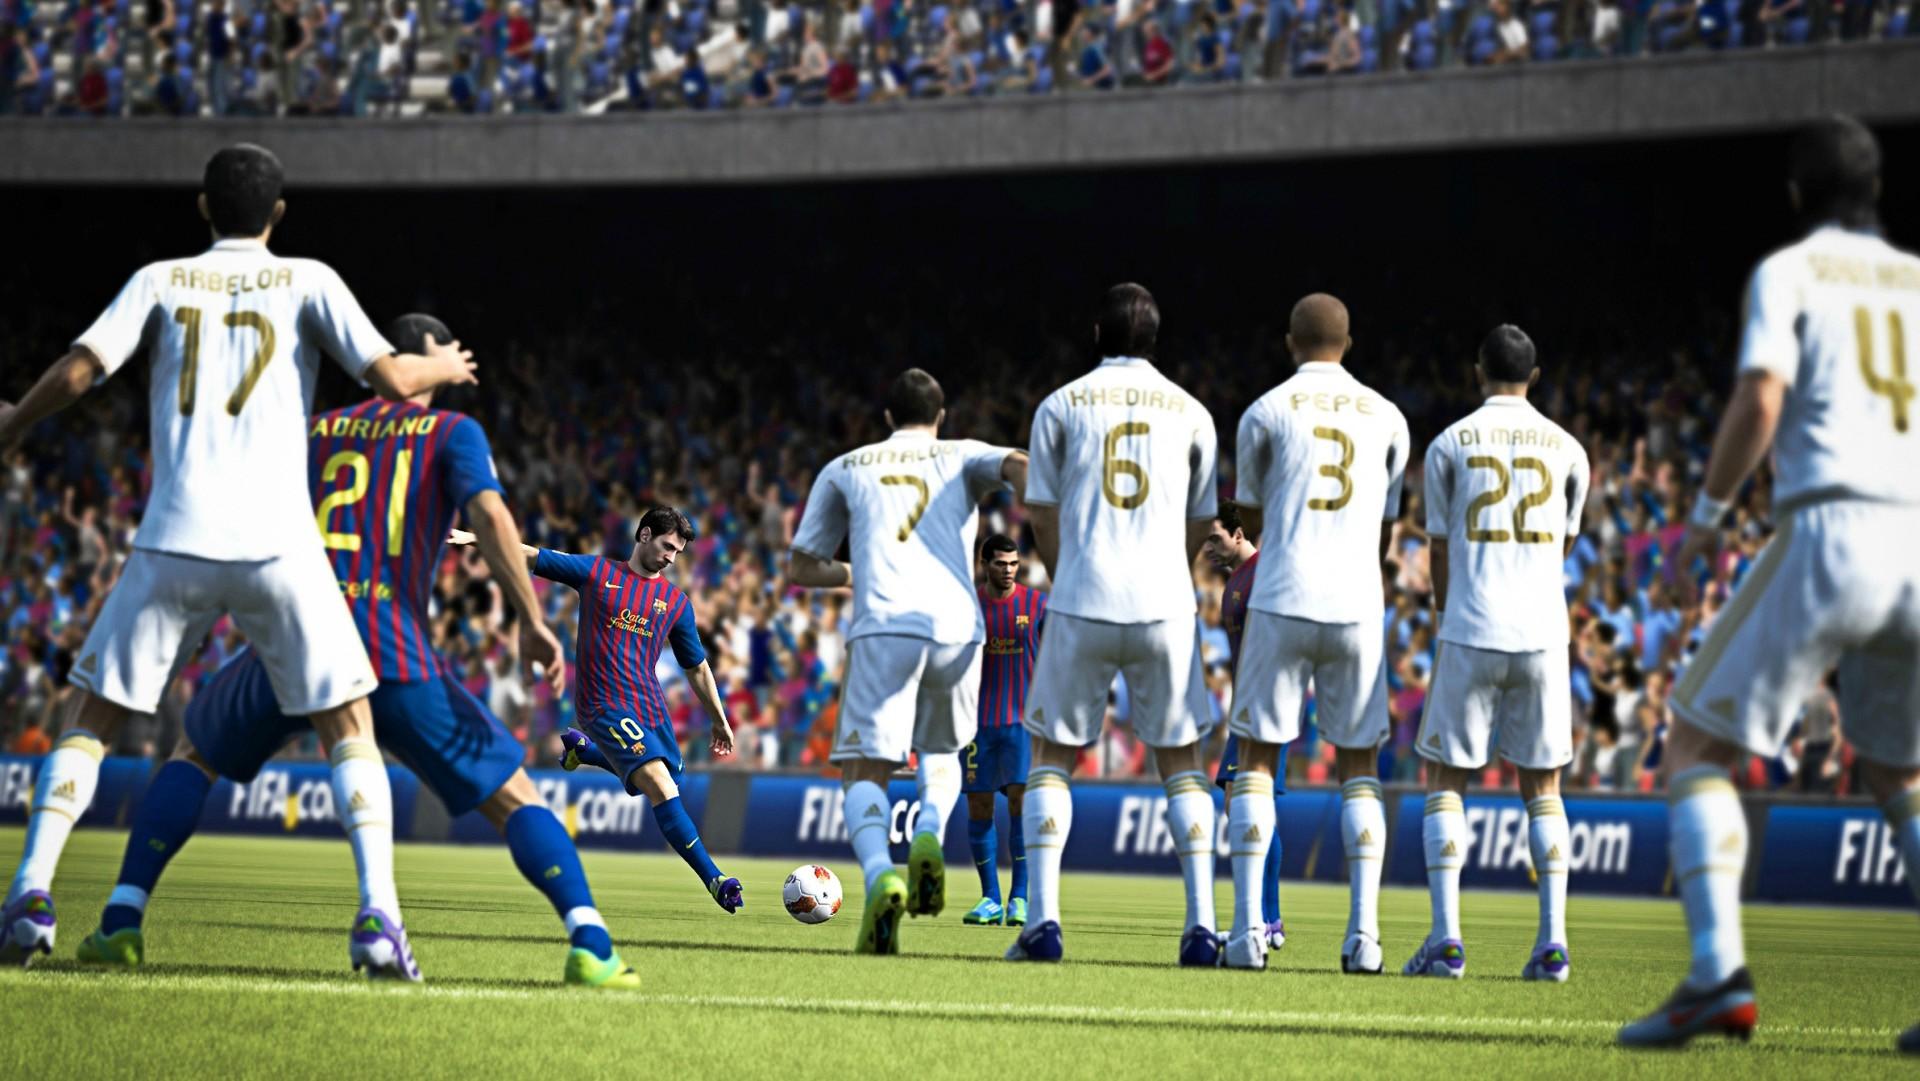 FIFA 13 Barcelona Real Madrid